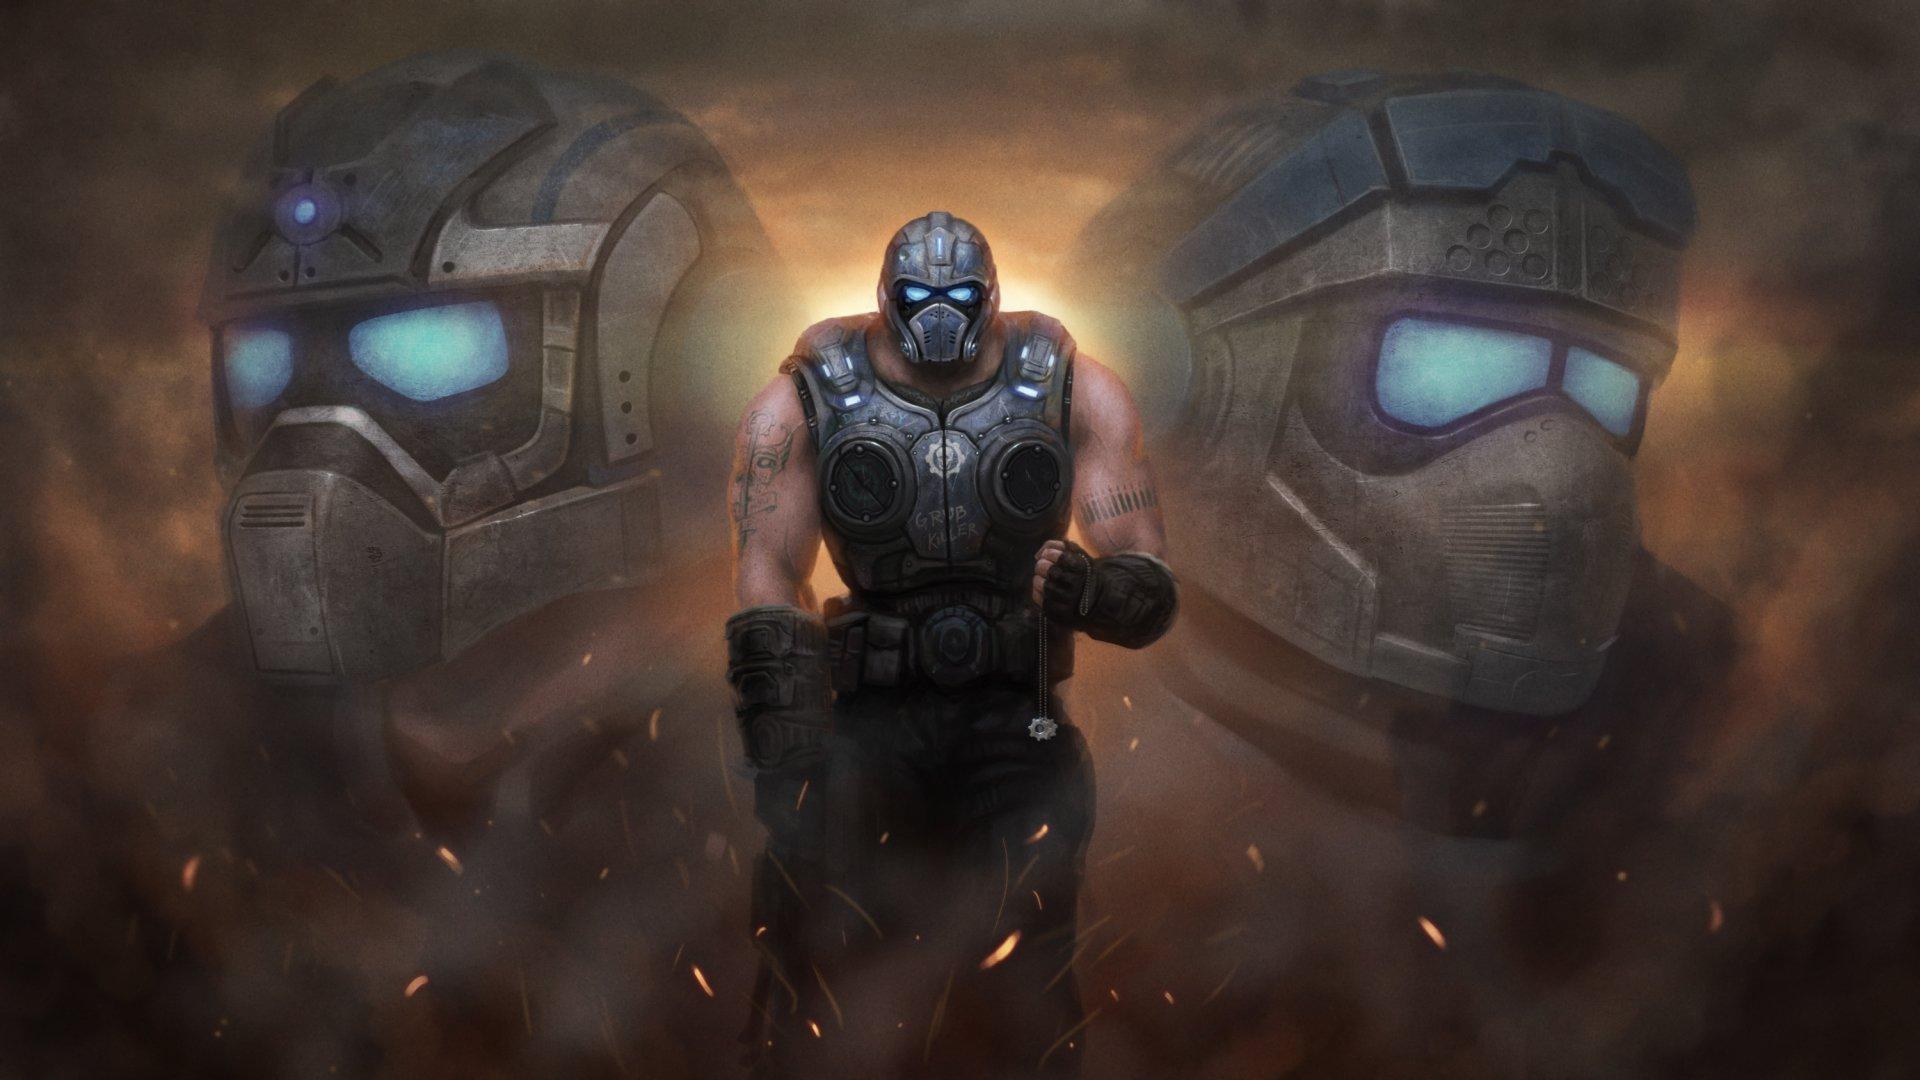 Gears Of War 3 Full HD Fondo De Pantalla And Fondo De